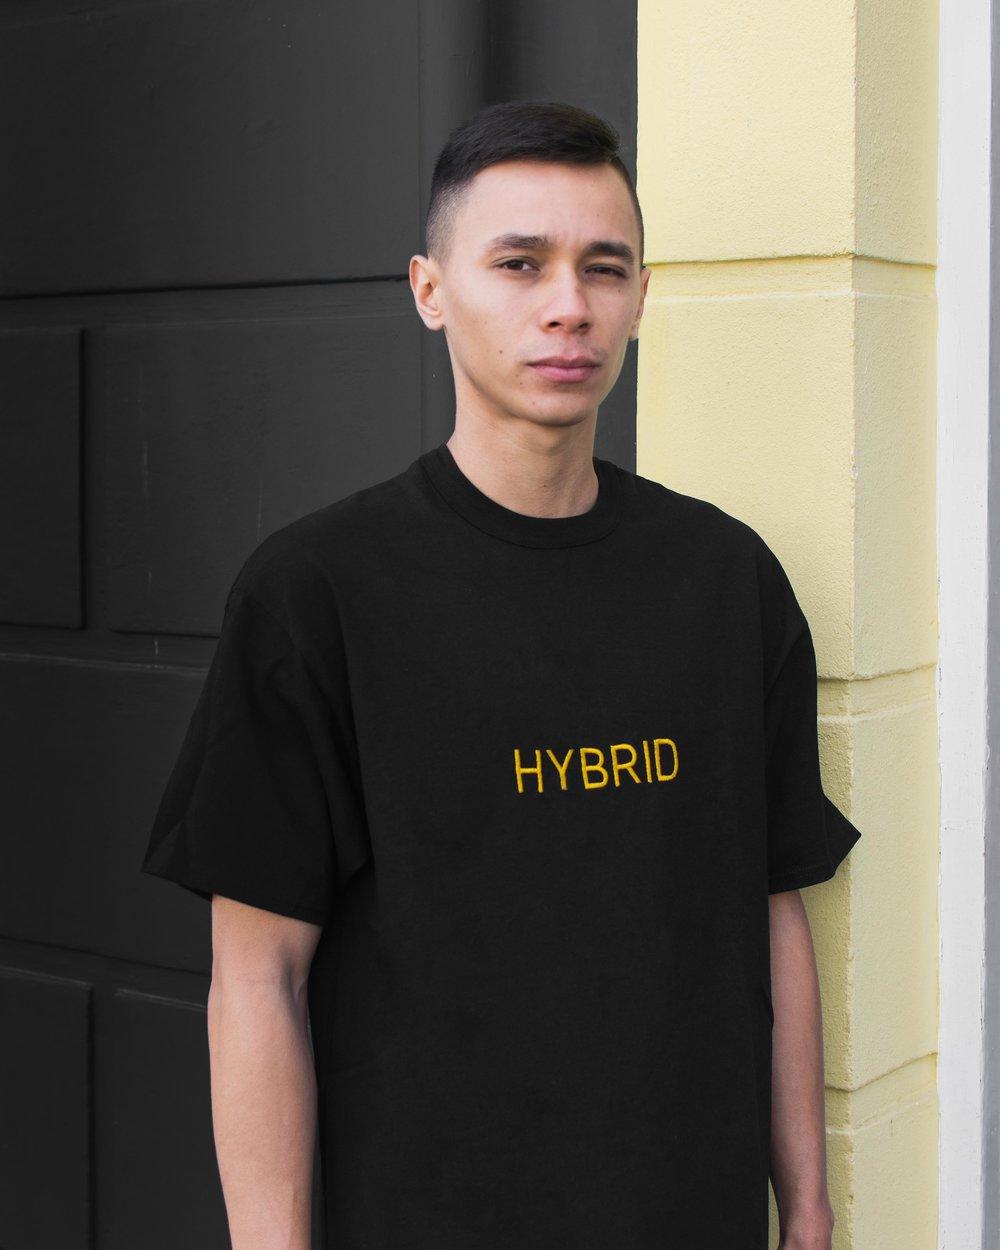 HybridS1_BlackTee_Front_1.jpg